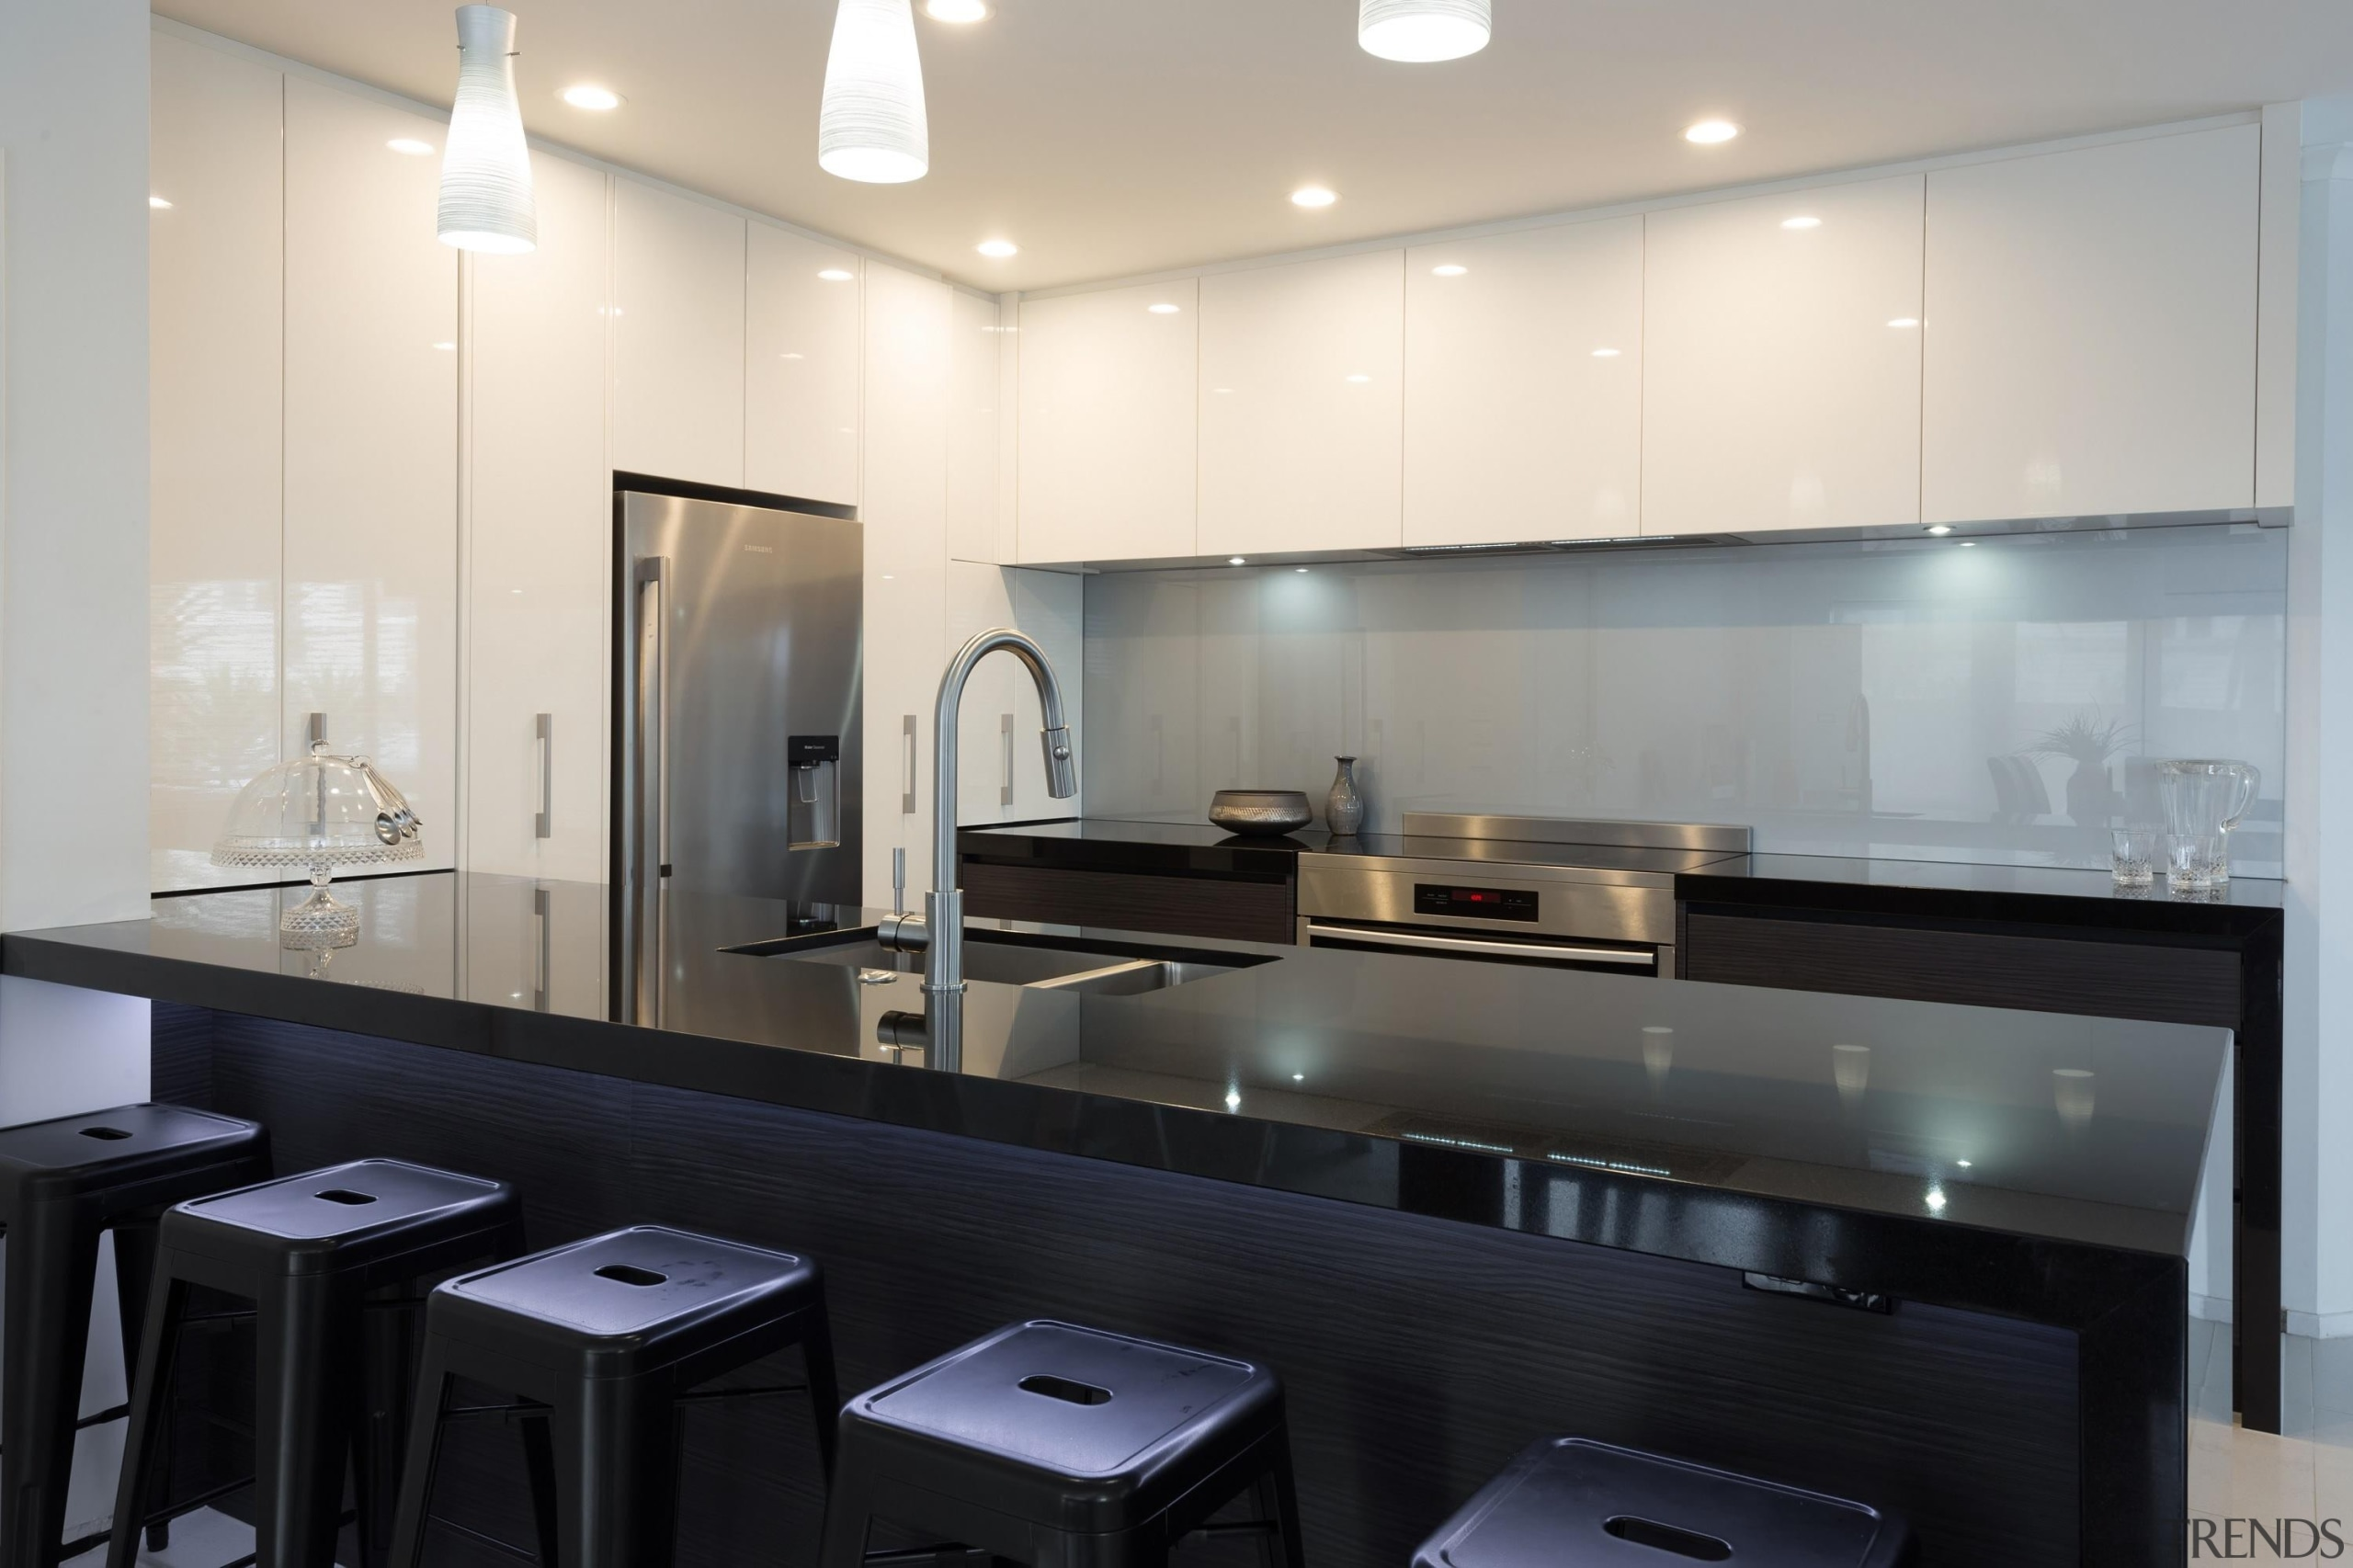 designatek gloss, designatek textured, profile handle, bar fridge, countertop, glass, interior design, kitchen, white, black, gray